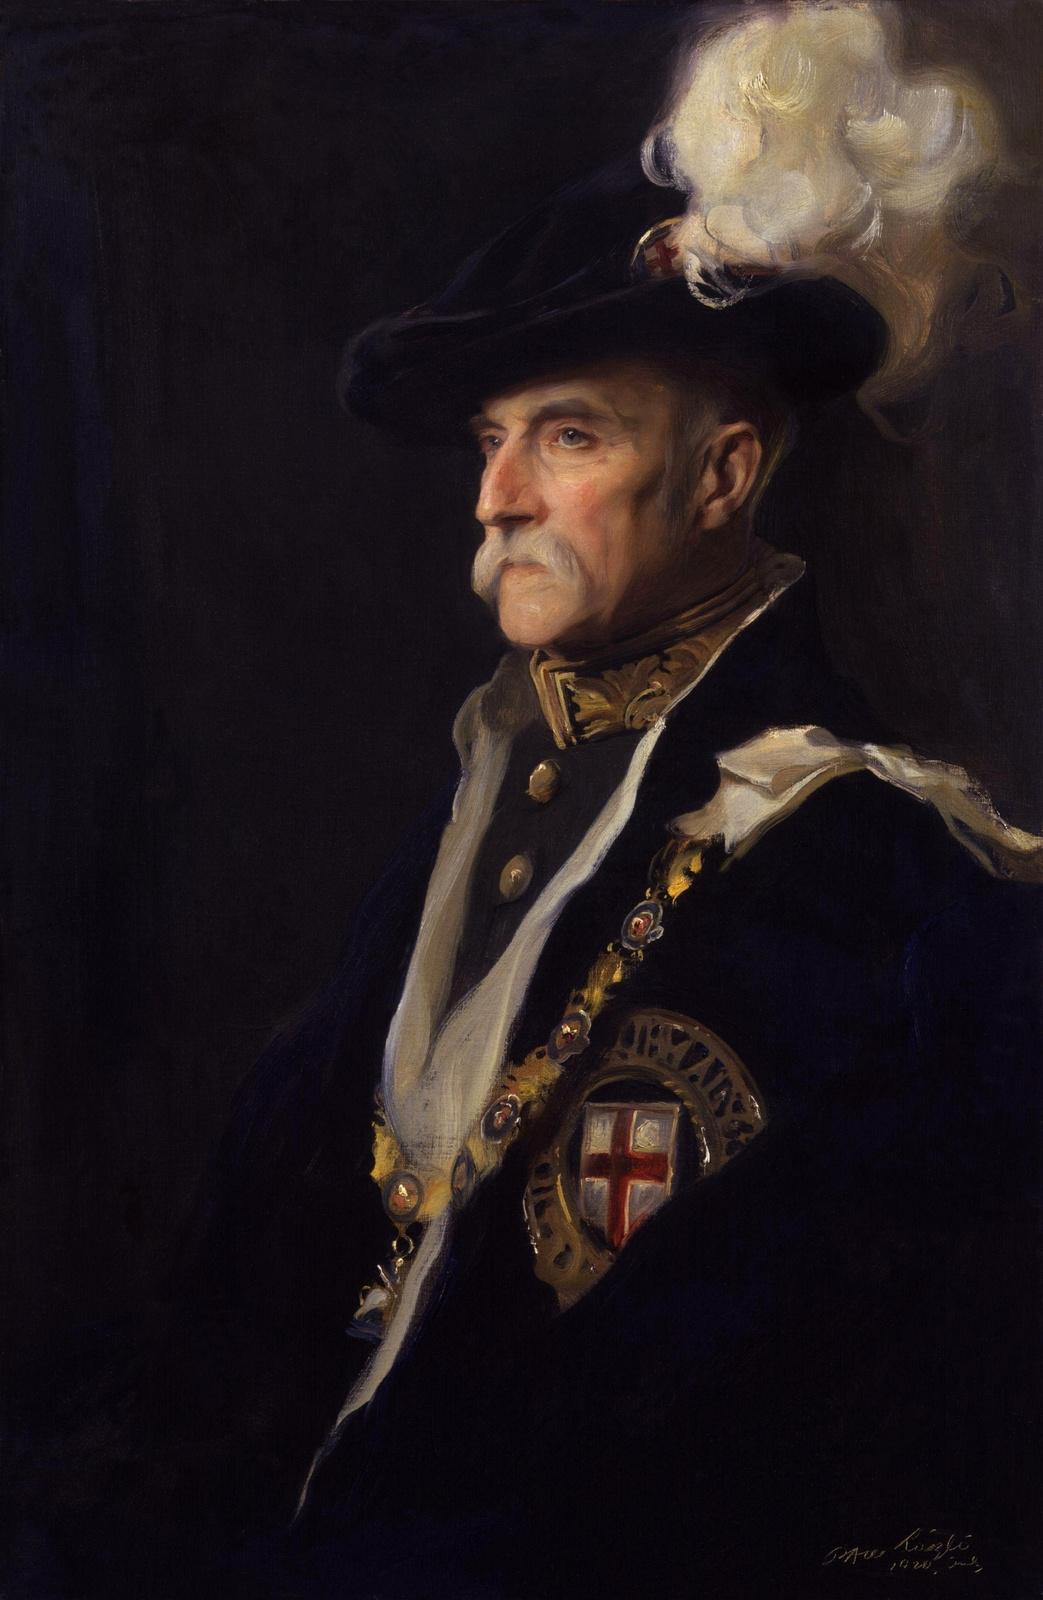 Филип Аликсис Де Ласло. Henry Charles Keith Petty-Fitzmouris. 1920